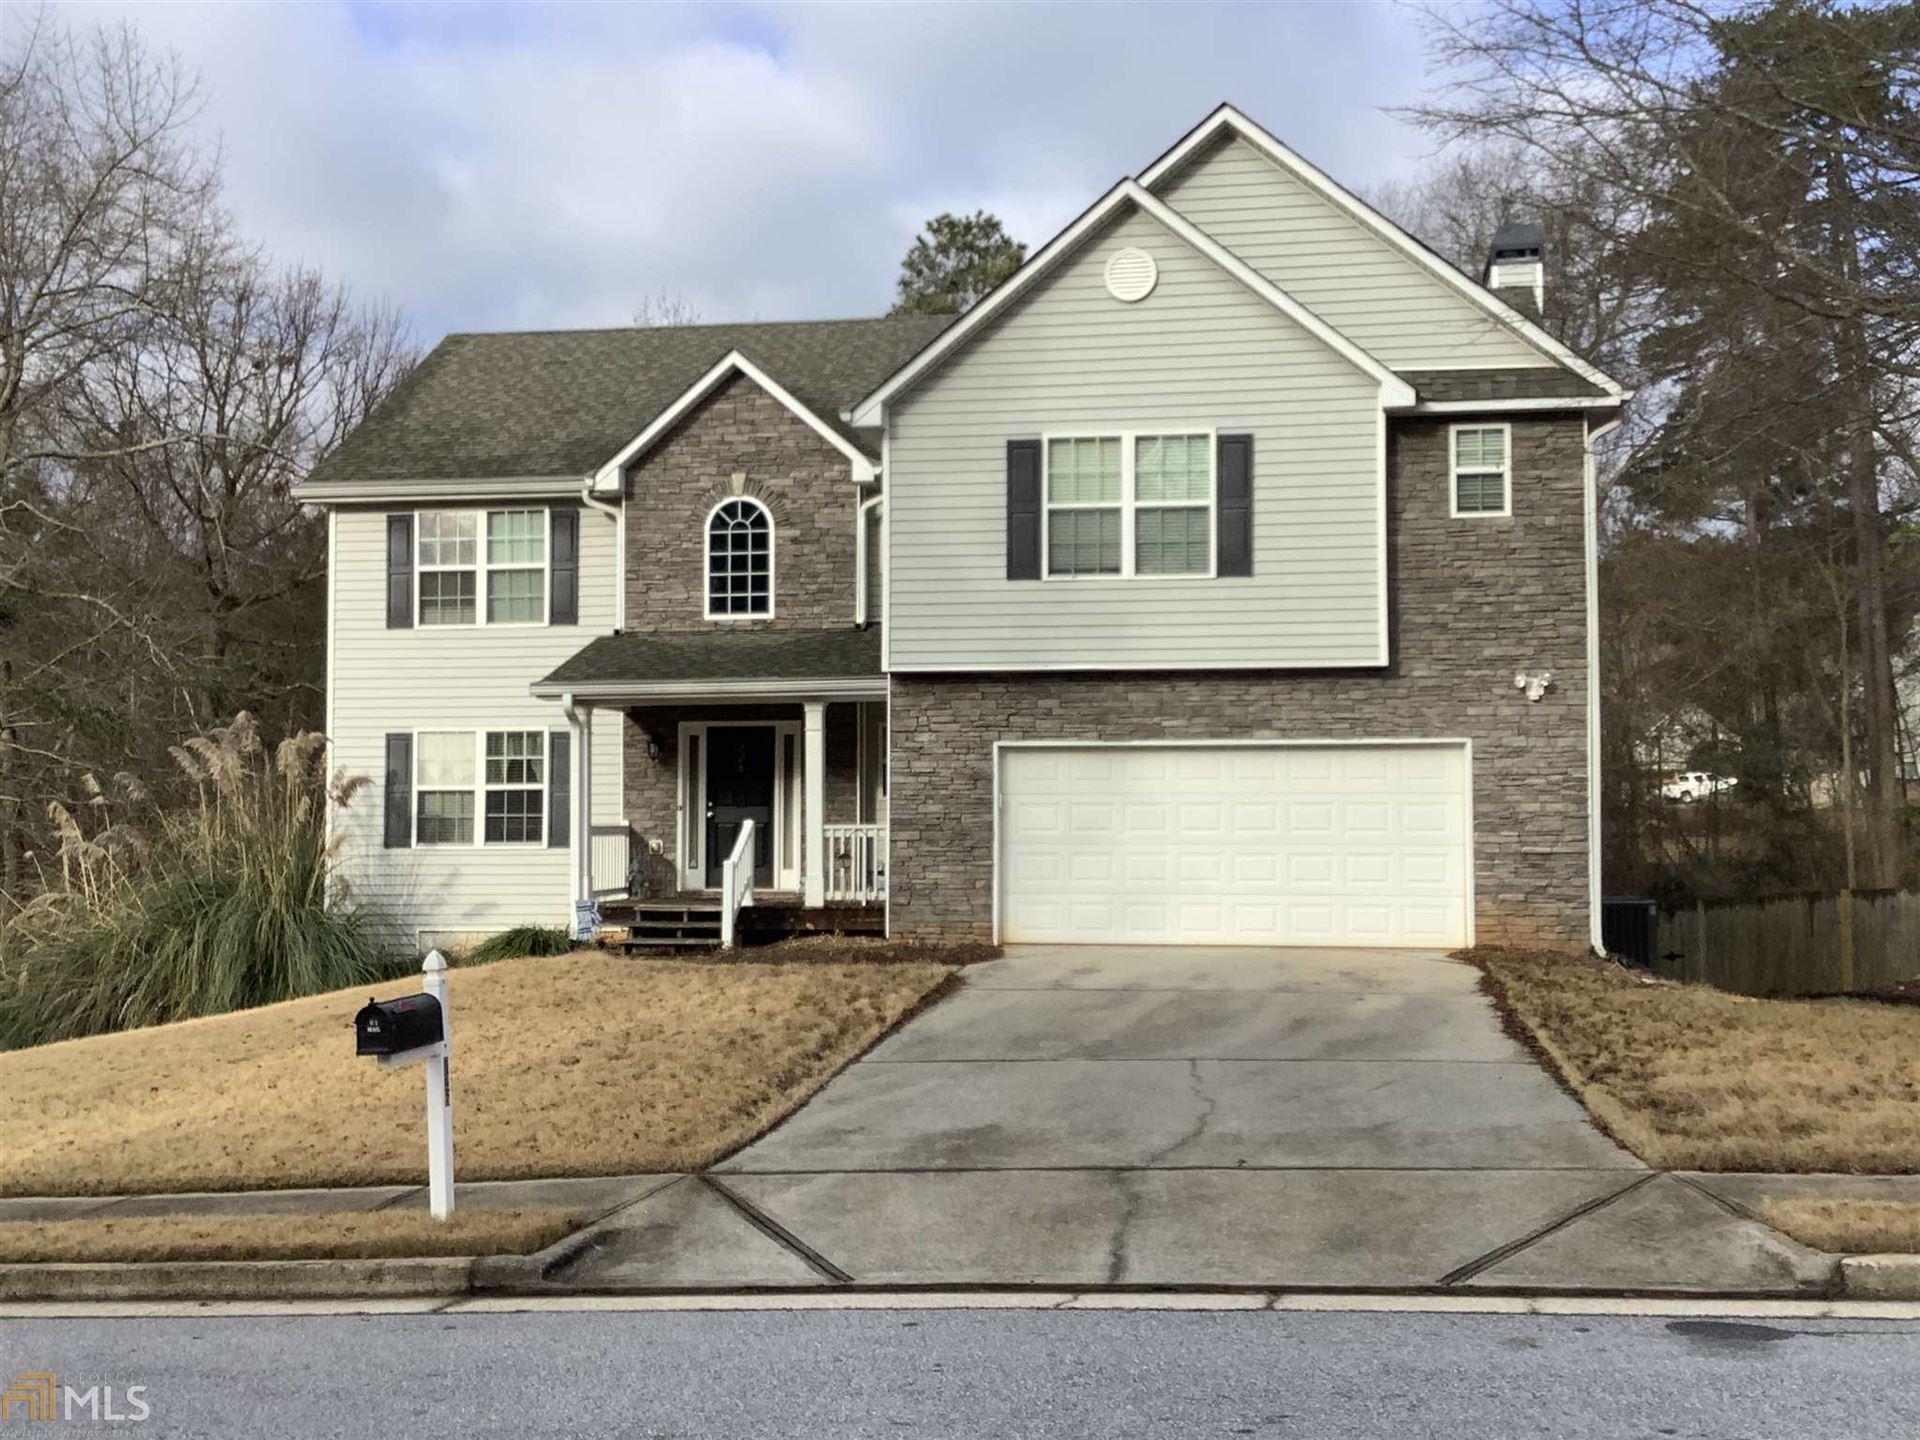 726 Thompson Ridge Ct, Monroe, GA 30655 - #: 8910731